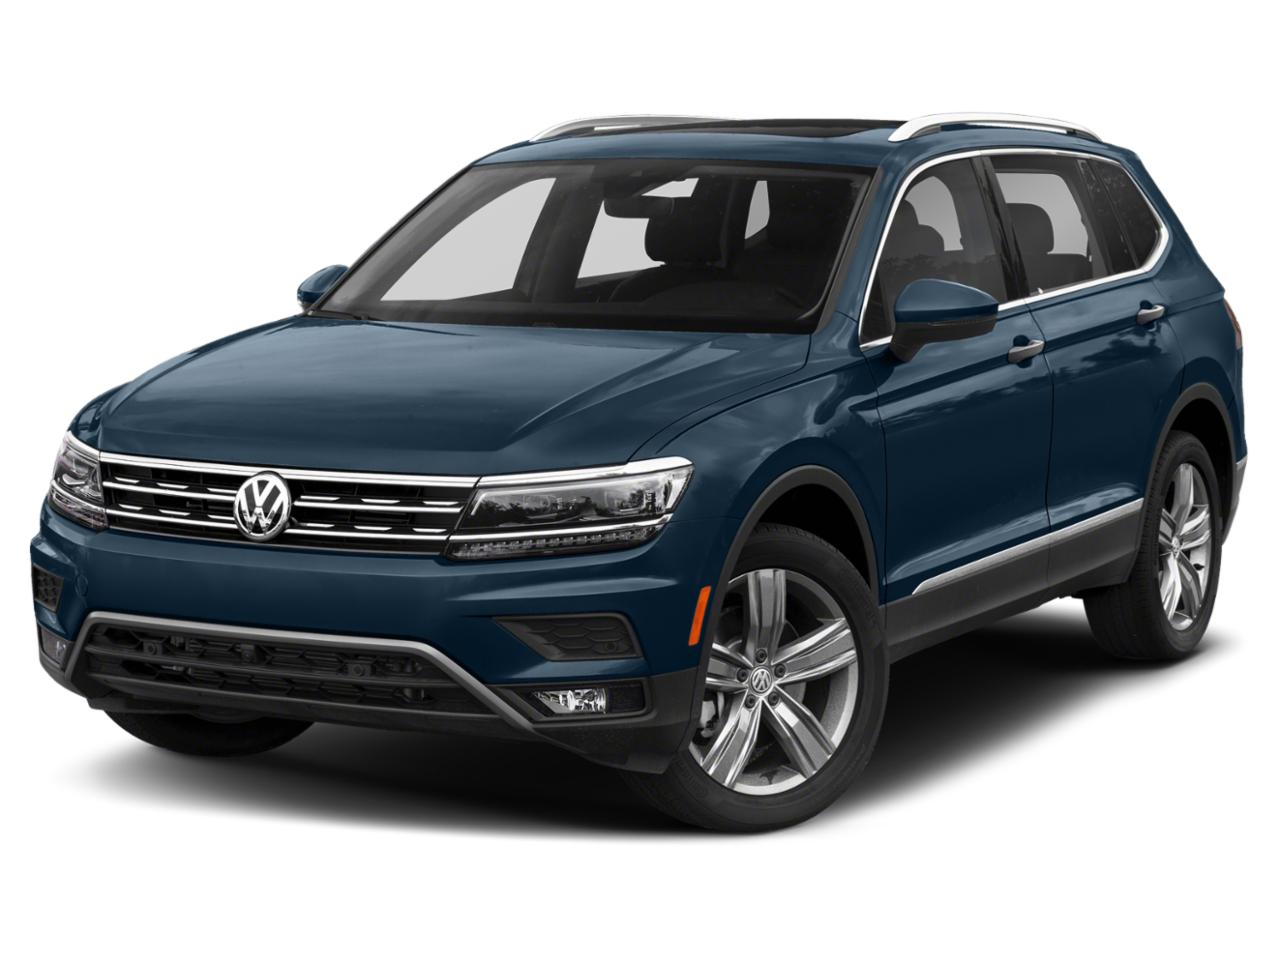 2018 Volkswagen Tiguan Vehicle Photo in Oshkosh, WI 54904